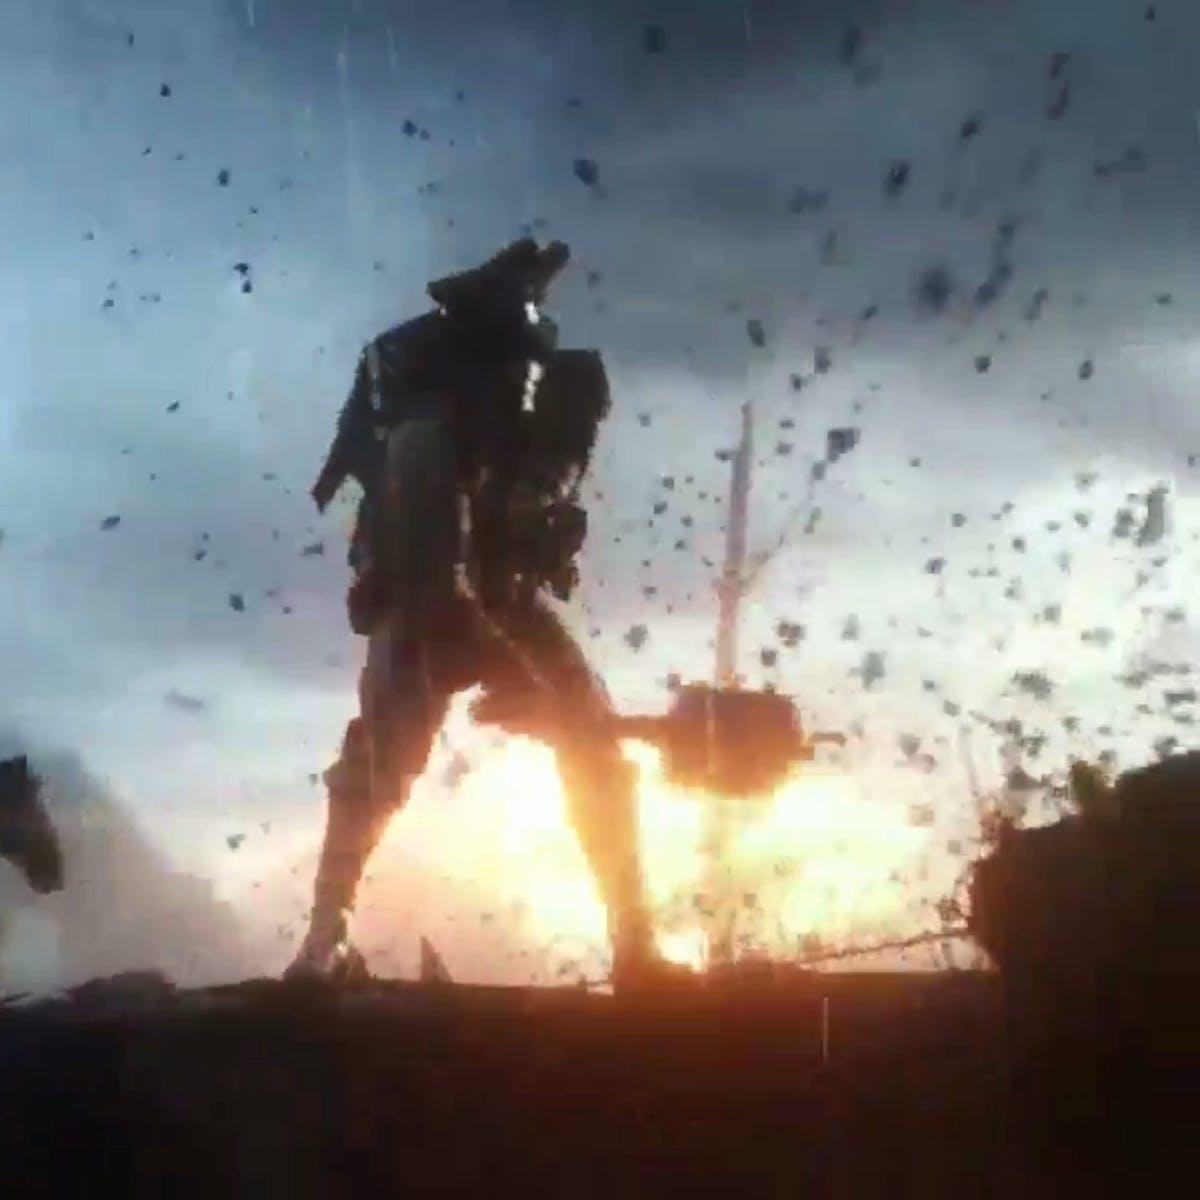 Why 'Battlefield 5' Might Look a Lot Like 'Fortnite Battle